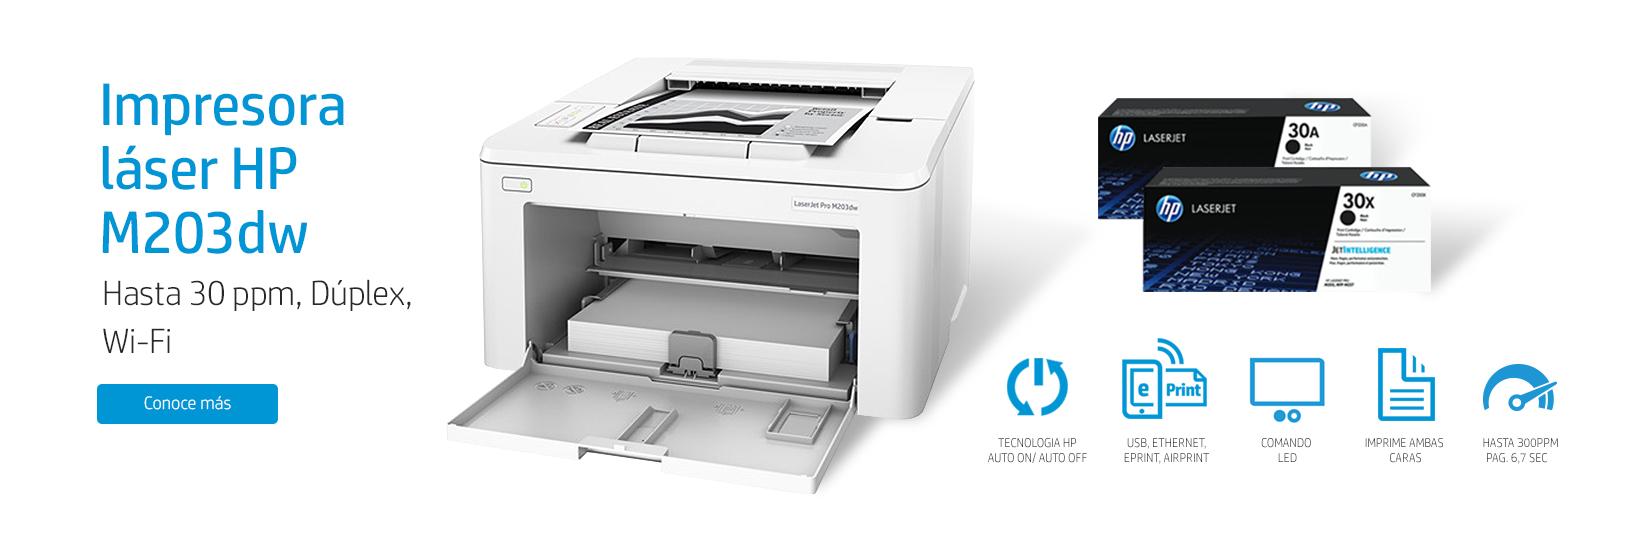 impresora-laser-hp-m203dw.jpg